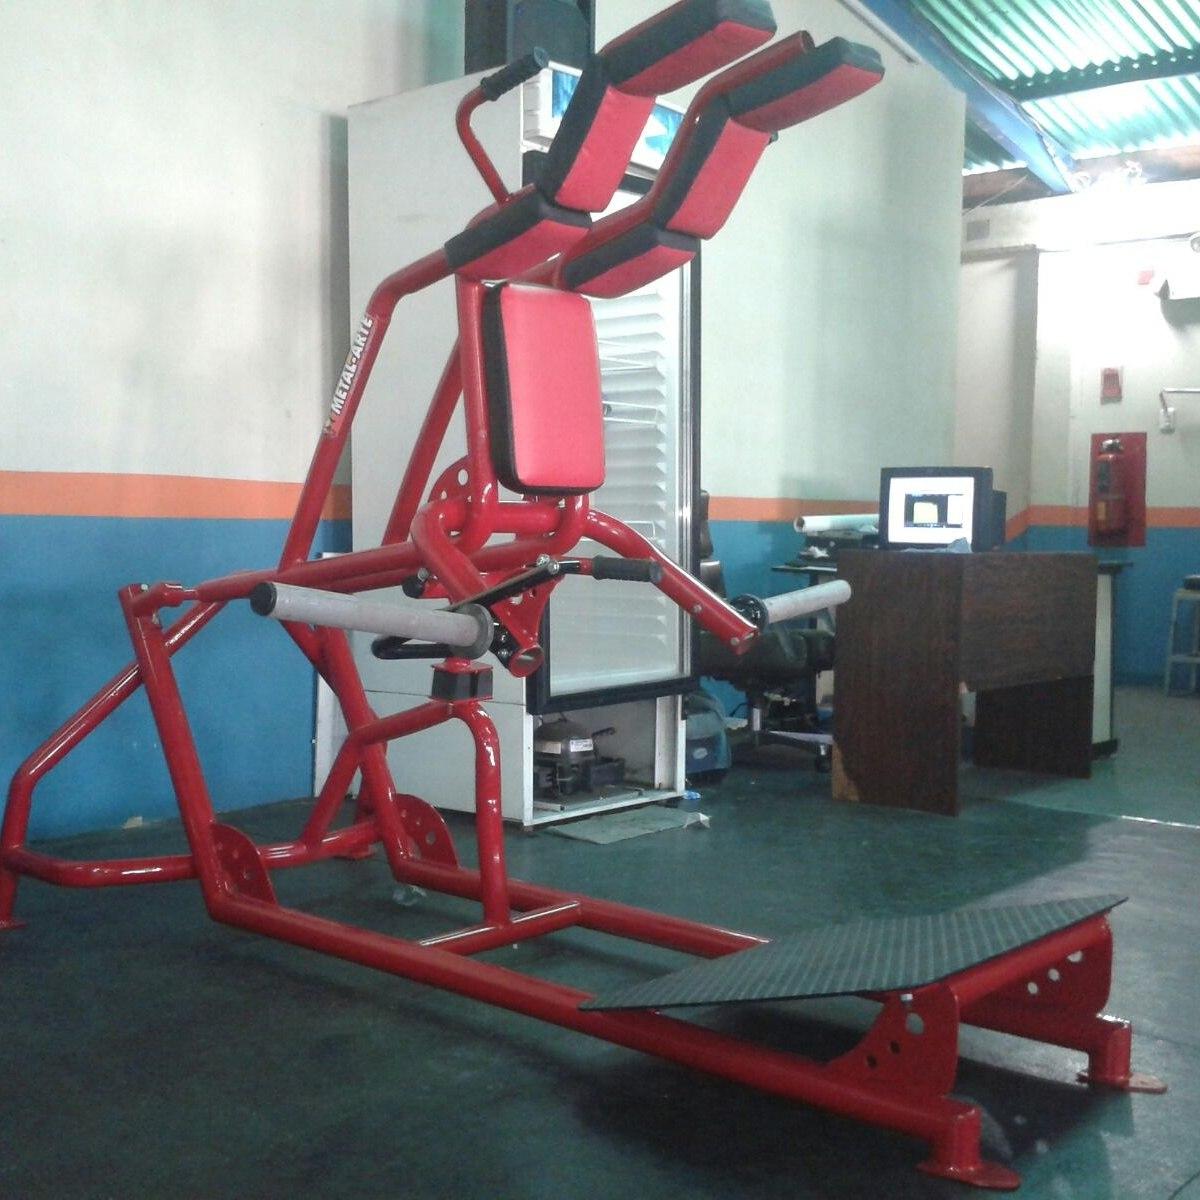 Fabricaci n de m quinas de gym barquisimeto en mercado for Equipo para gym